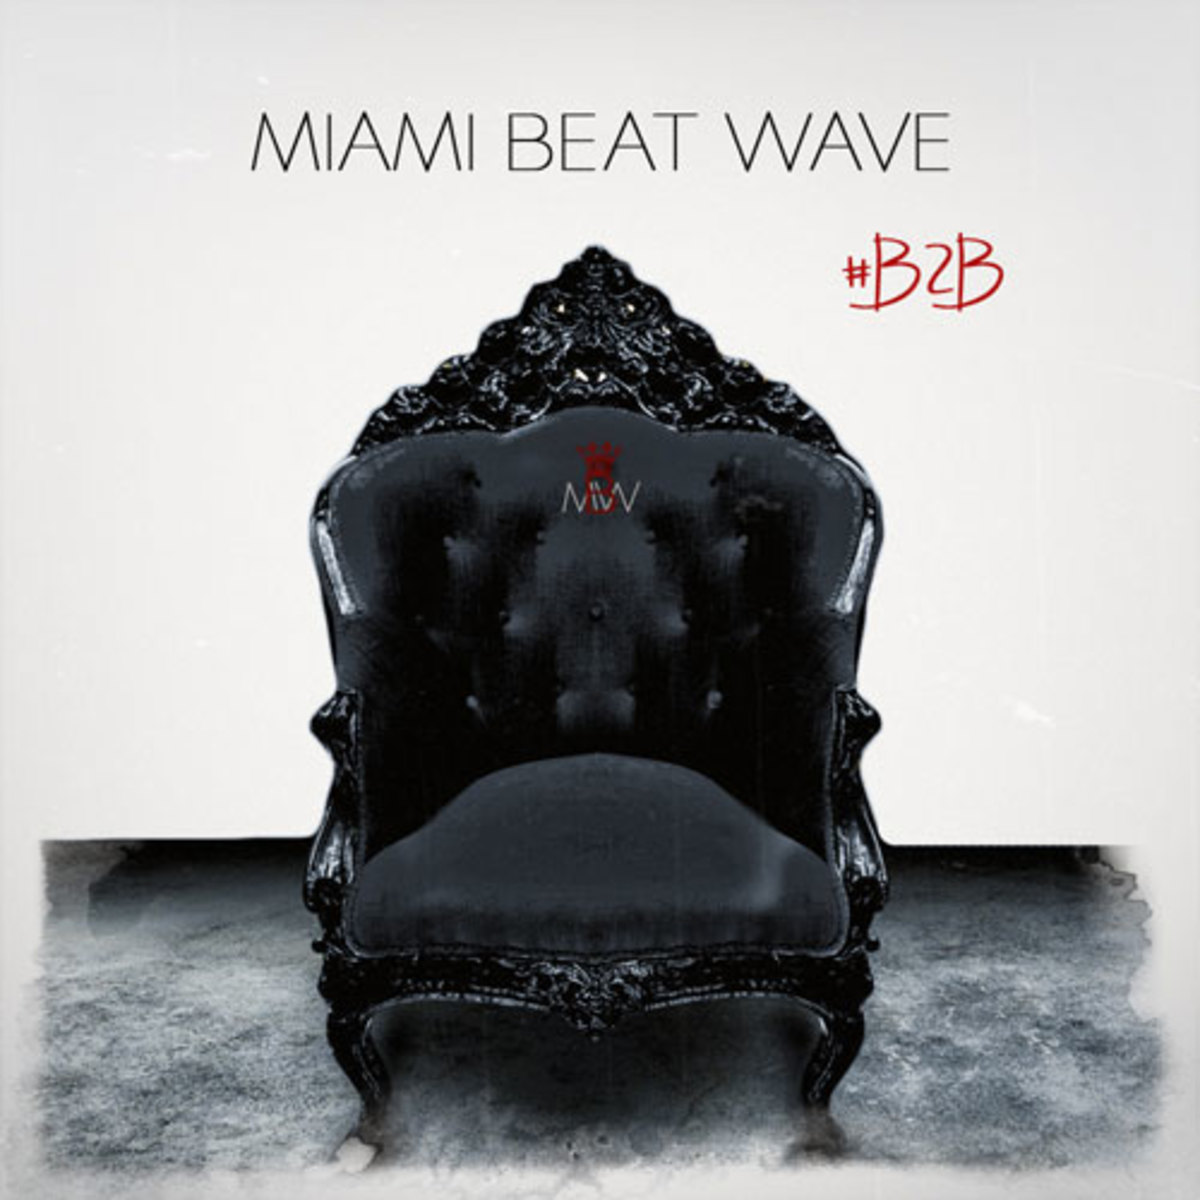 miamibeatwave-b2b.jpg